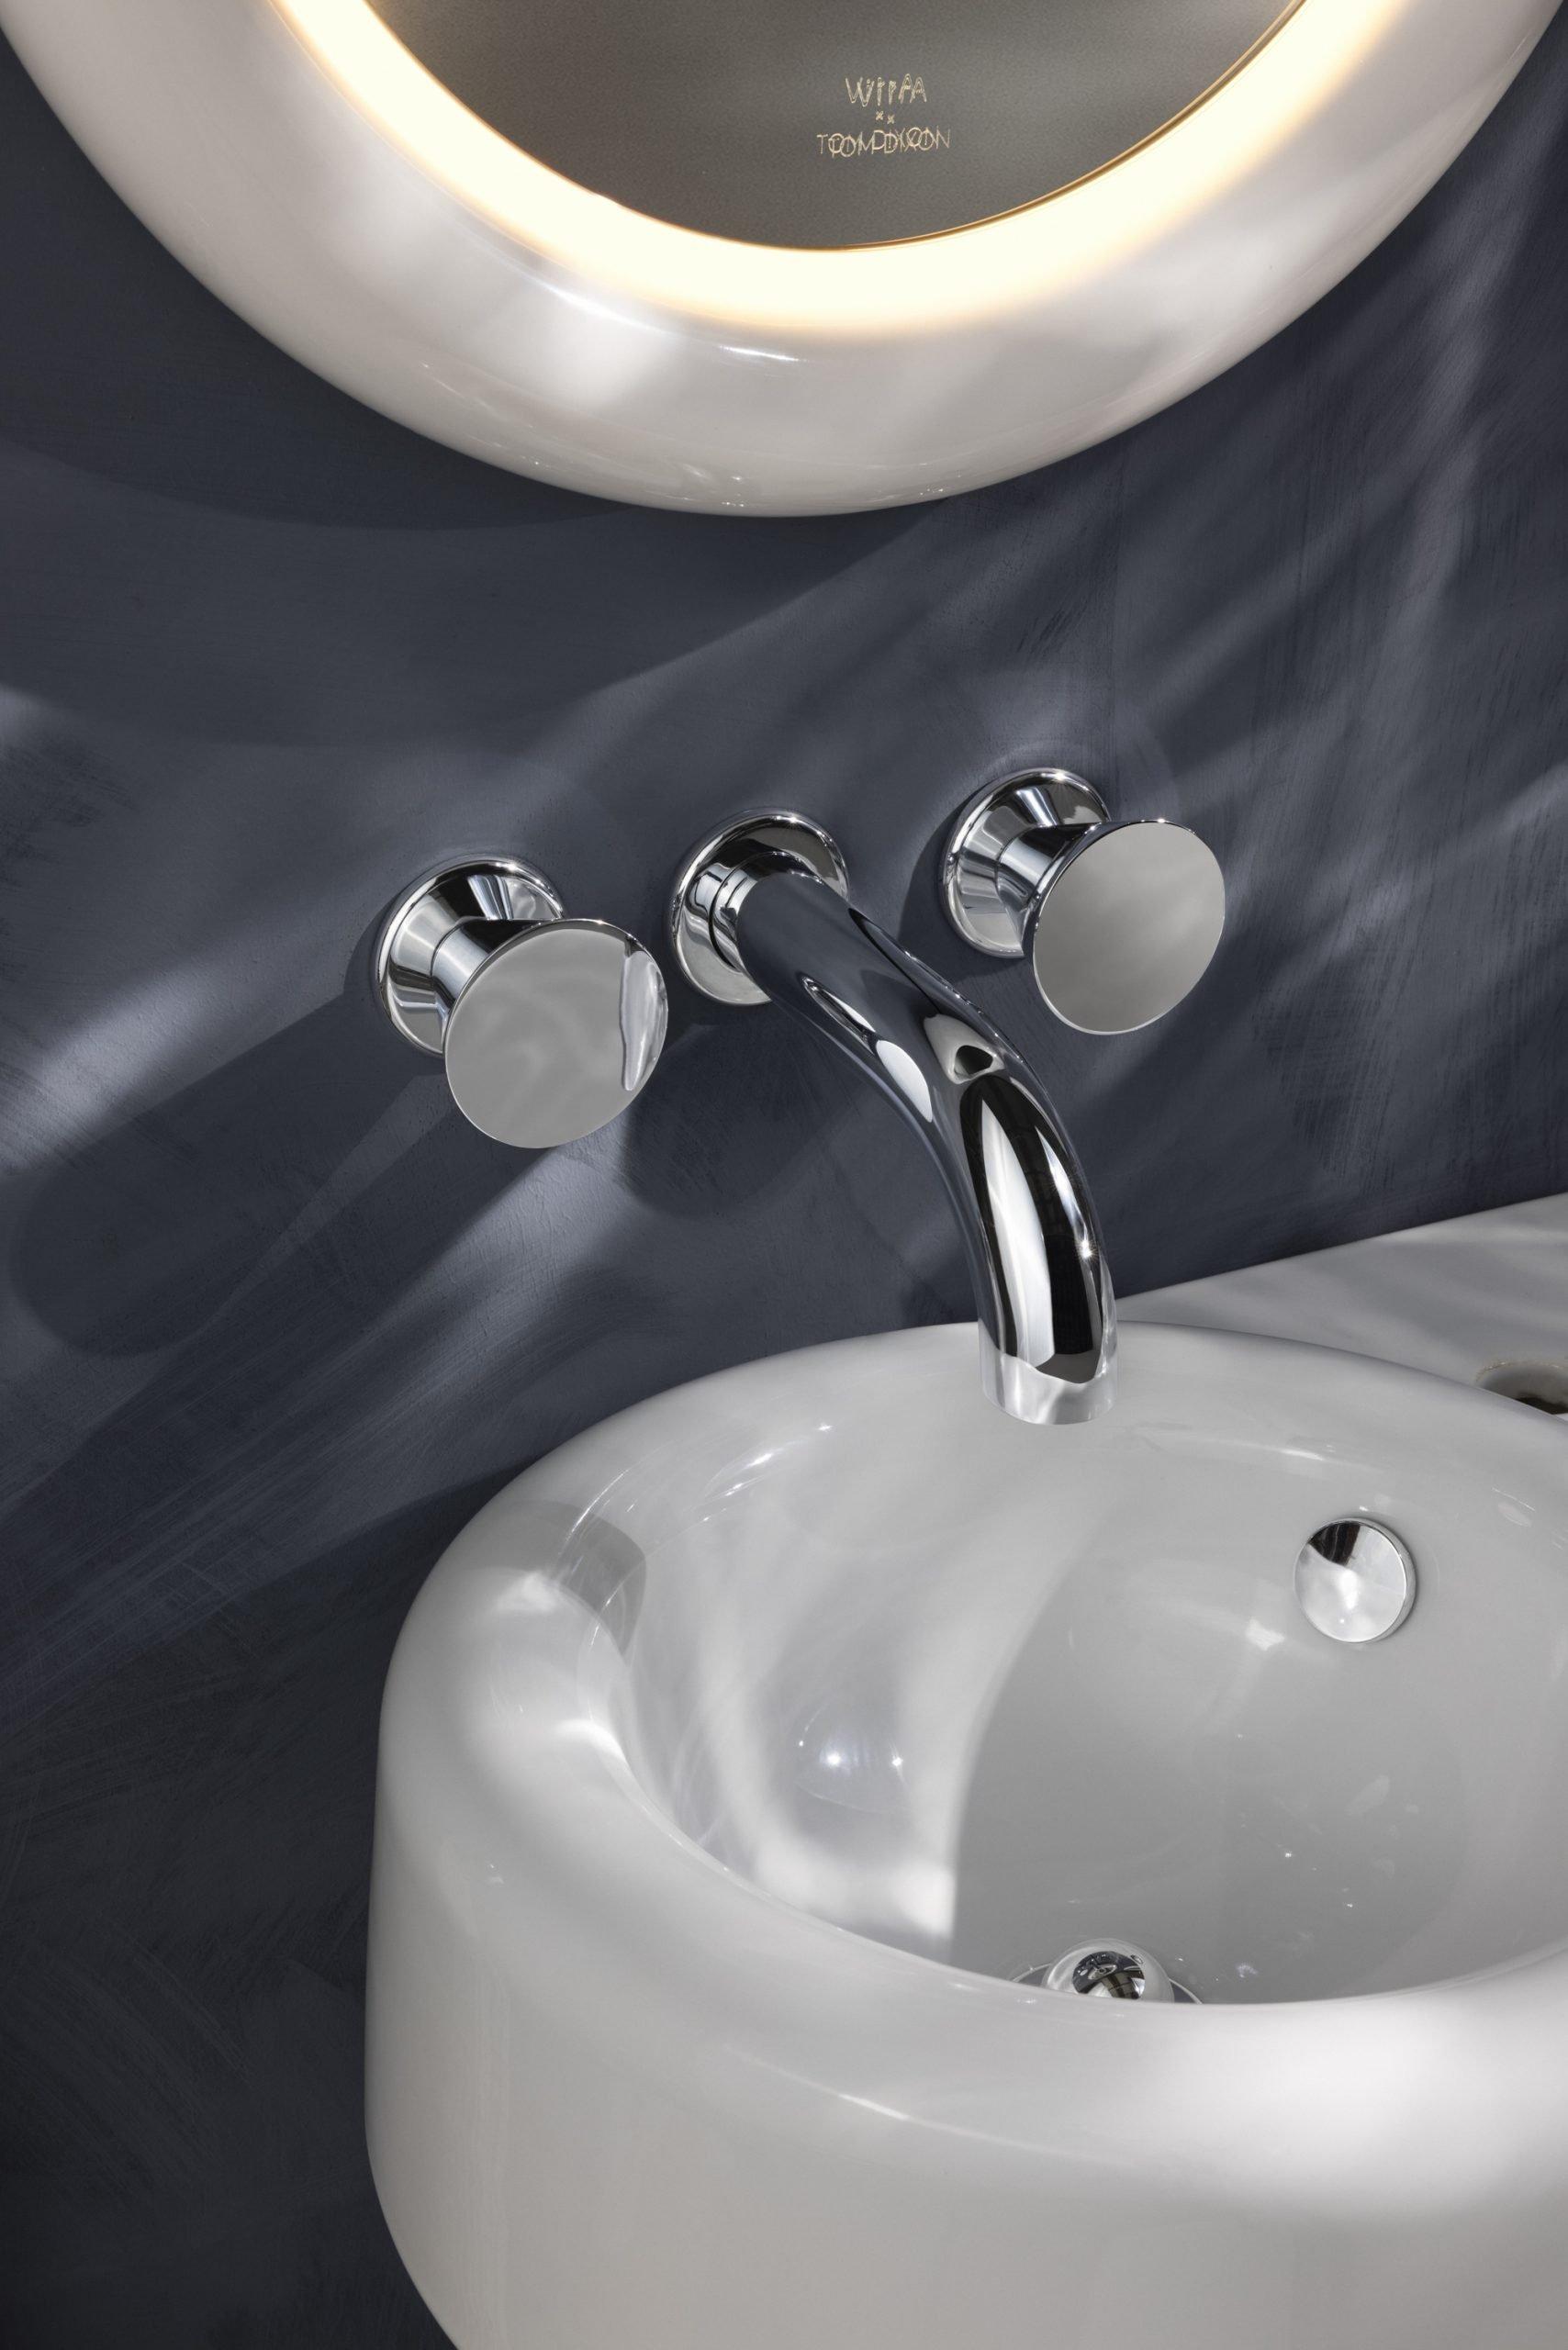 VitrA introduces Liquid, a new bathroom range in collaboration with Tom Dixon